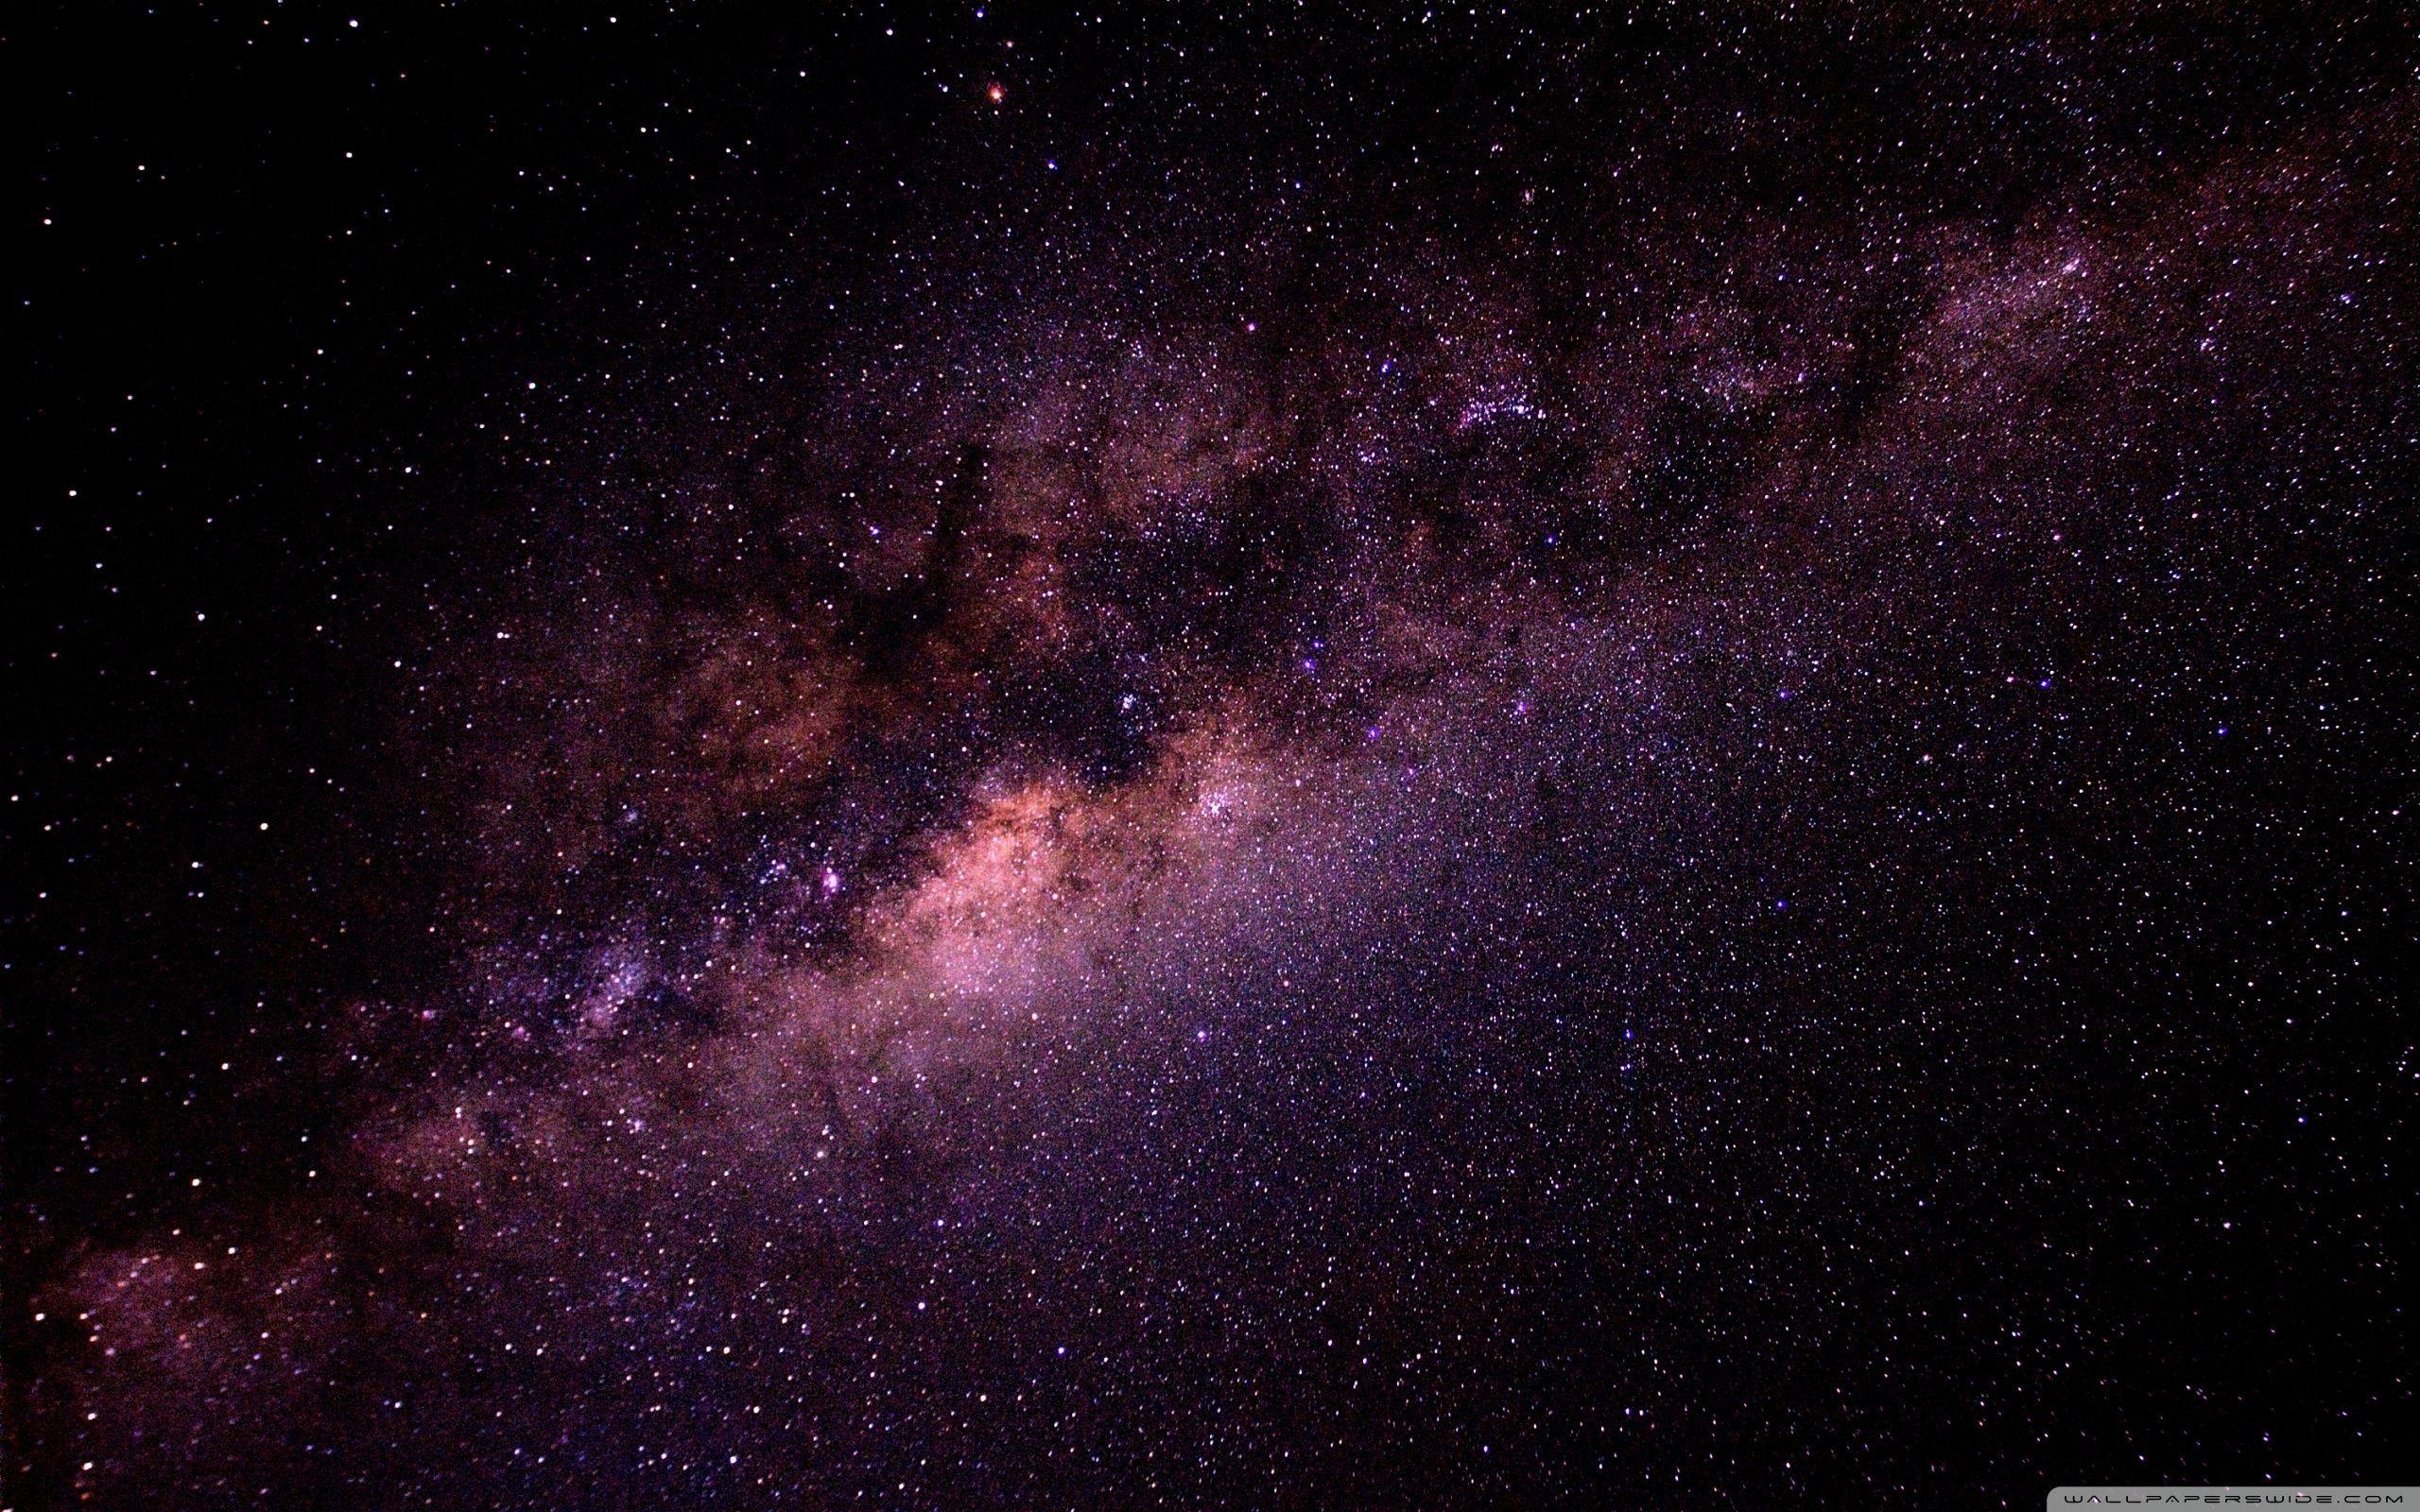 10 Best The Milky Way Galaxy Wallpaper Full Hd 1080p For Pc Background In 2020 Galaxy Phone Wallpaper Galaxy Wallpaper Galaxy Hd